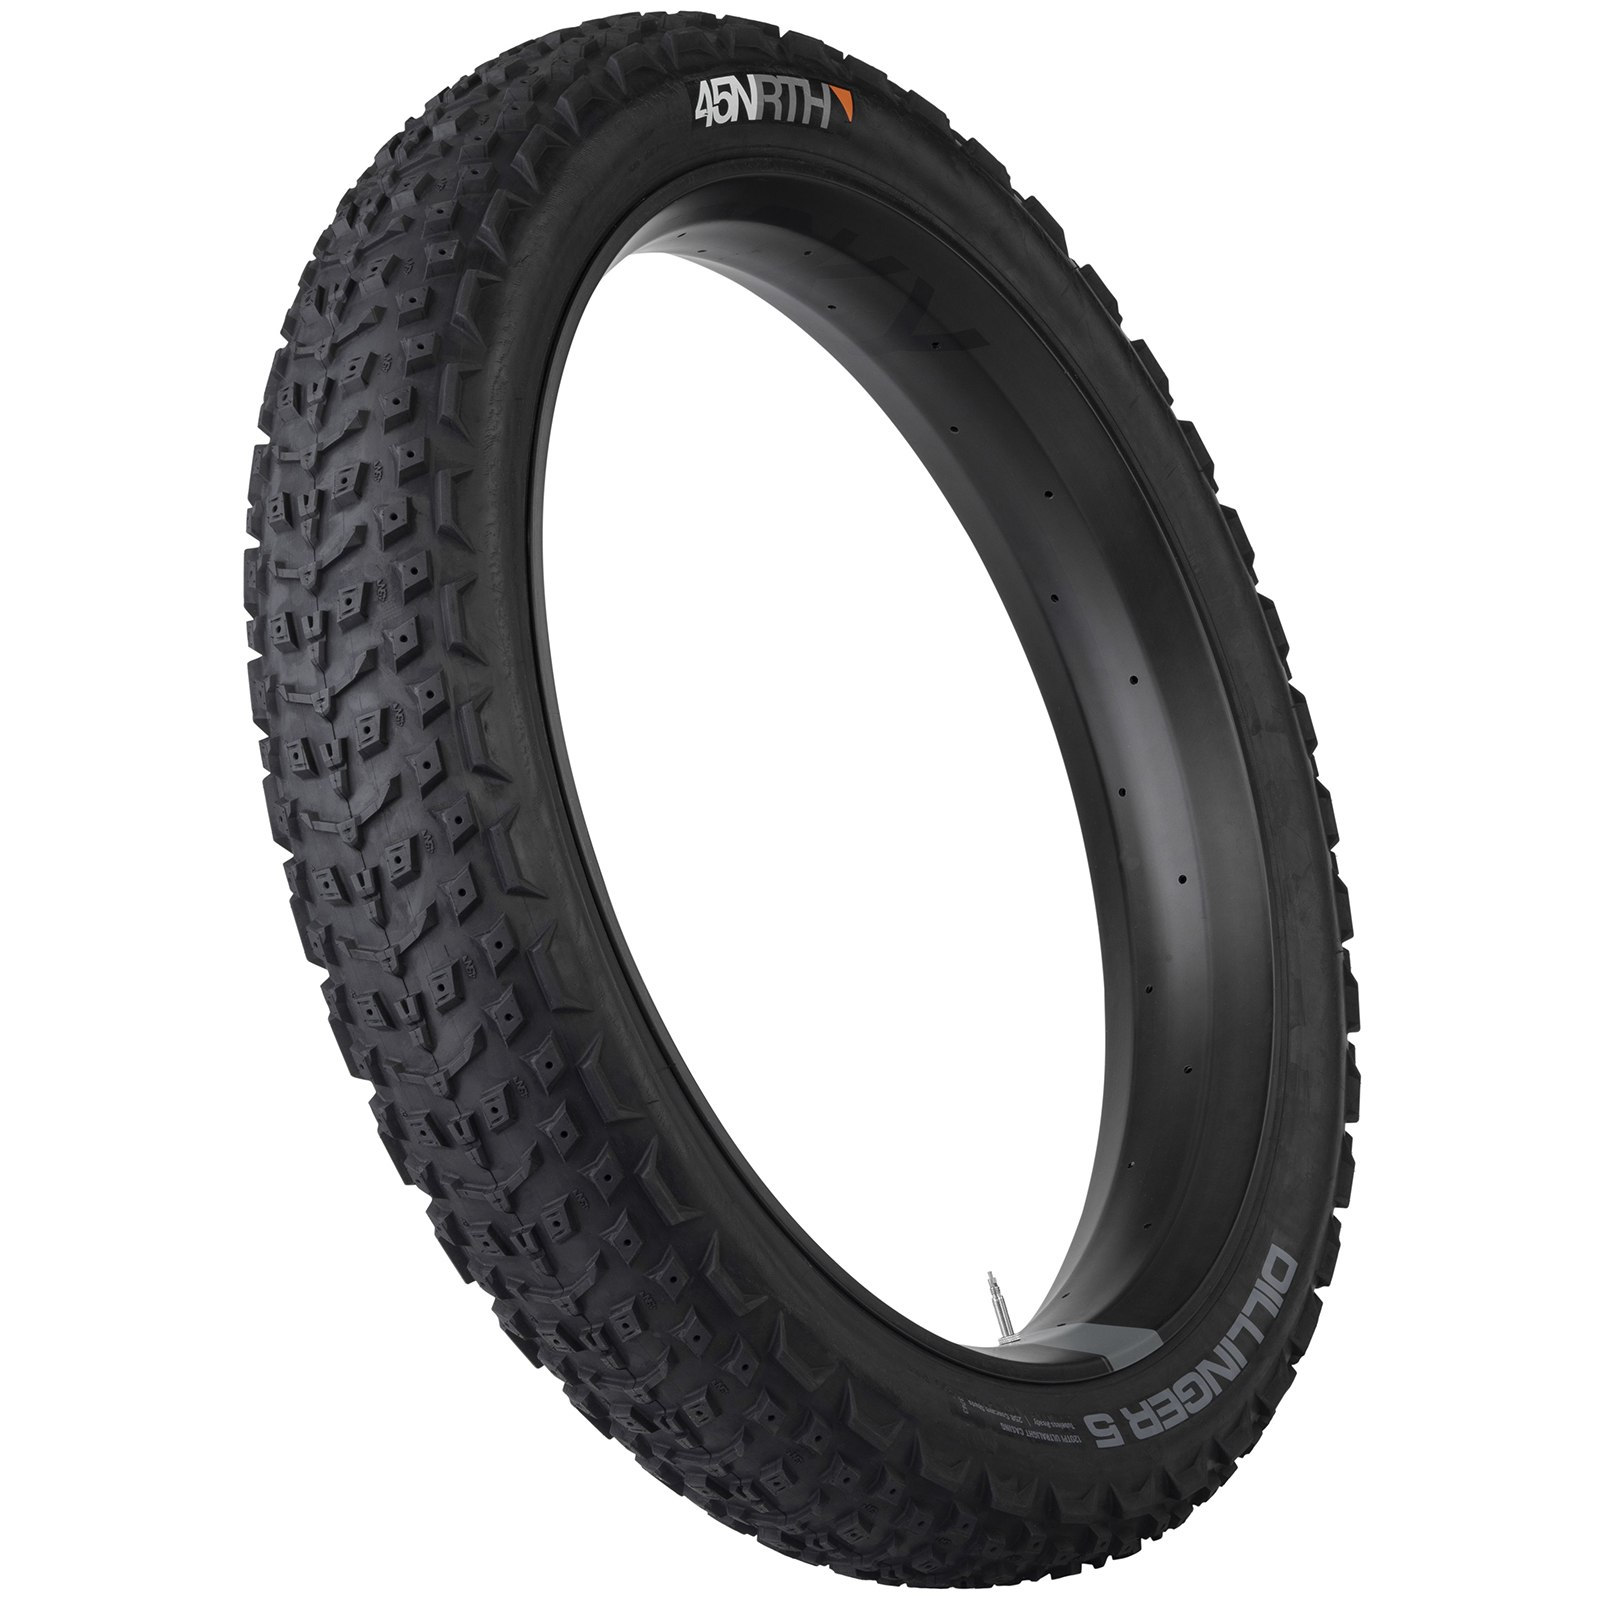 Imagen de 45NRTH Dillinger 5 Fatbike Folding Tire - Spike Ready - Tubeless Ready - 26x4.6 Inches - 120TPI Ultralight